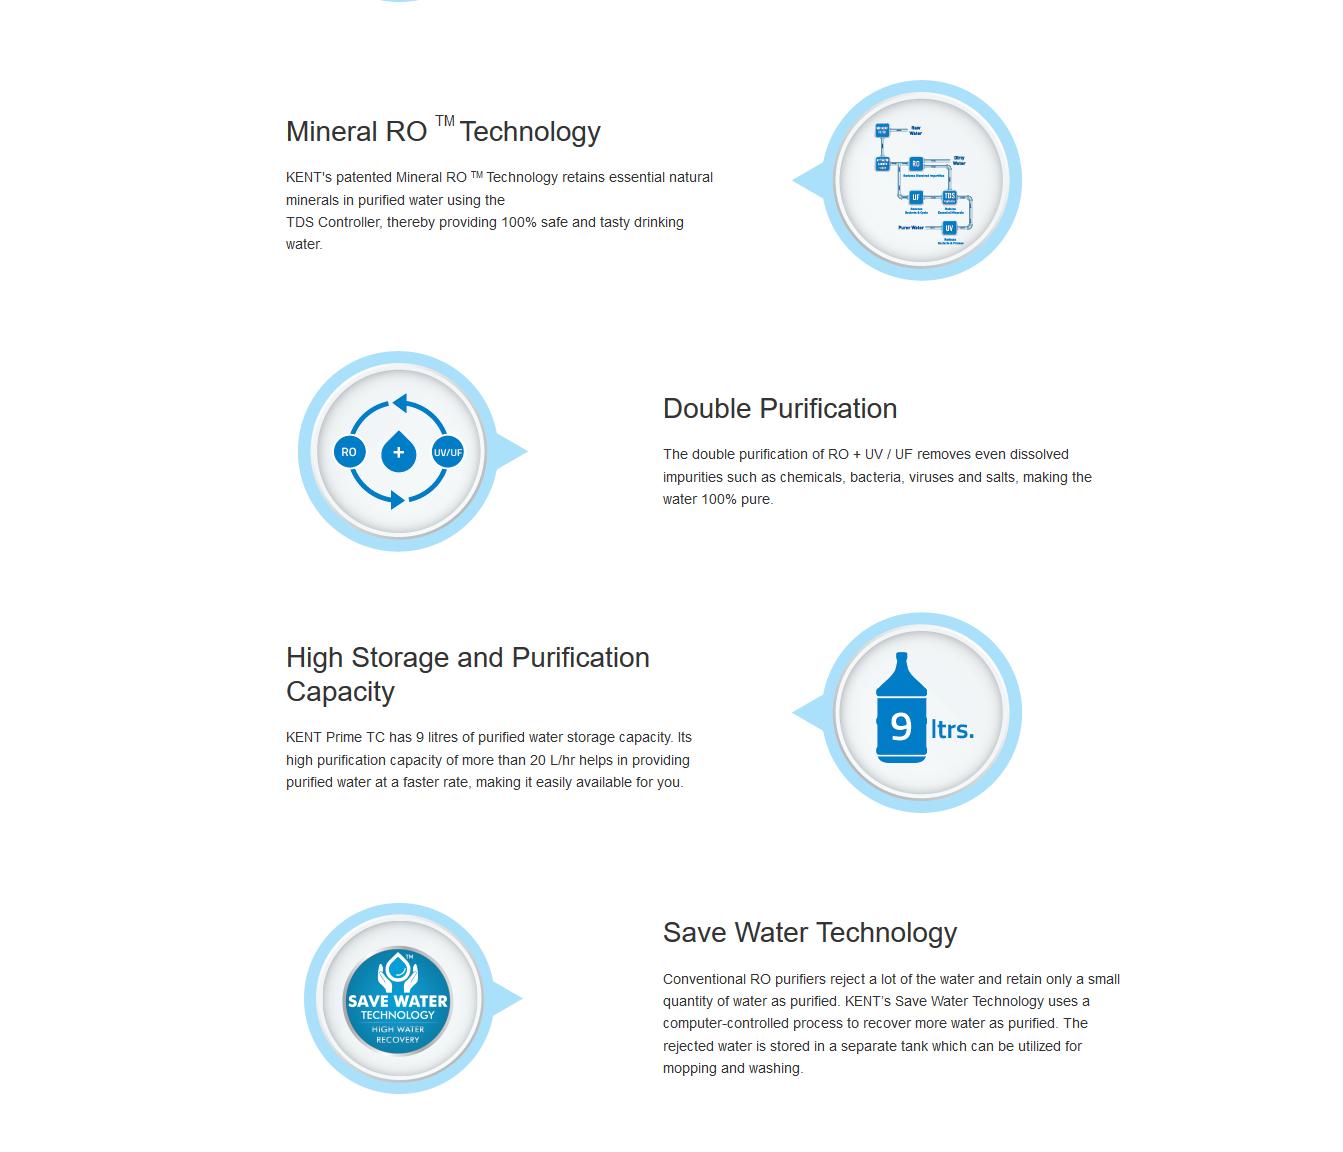 KENT Prime TC Water Purifier - KENT RO System